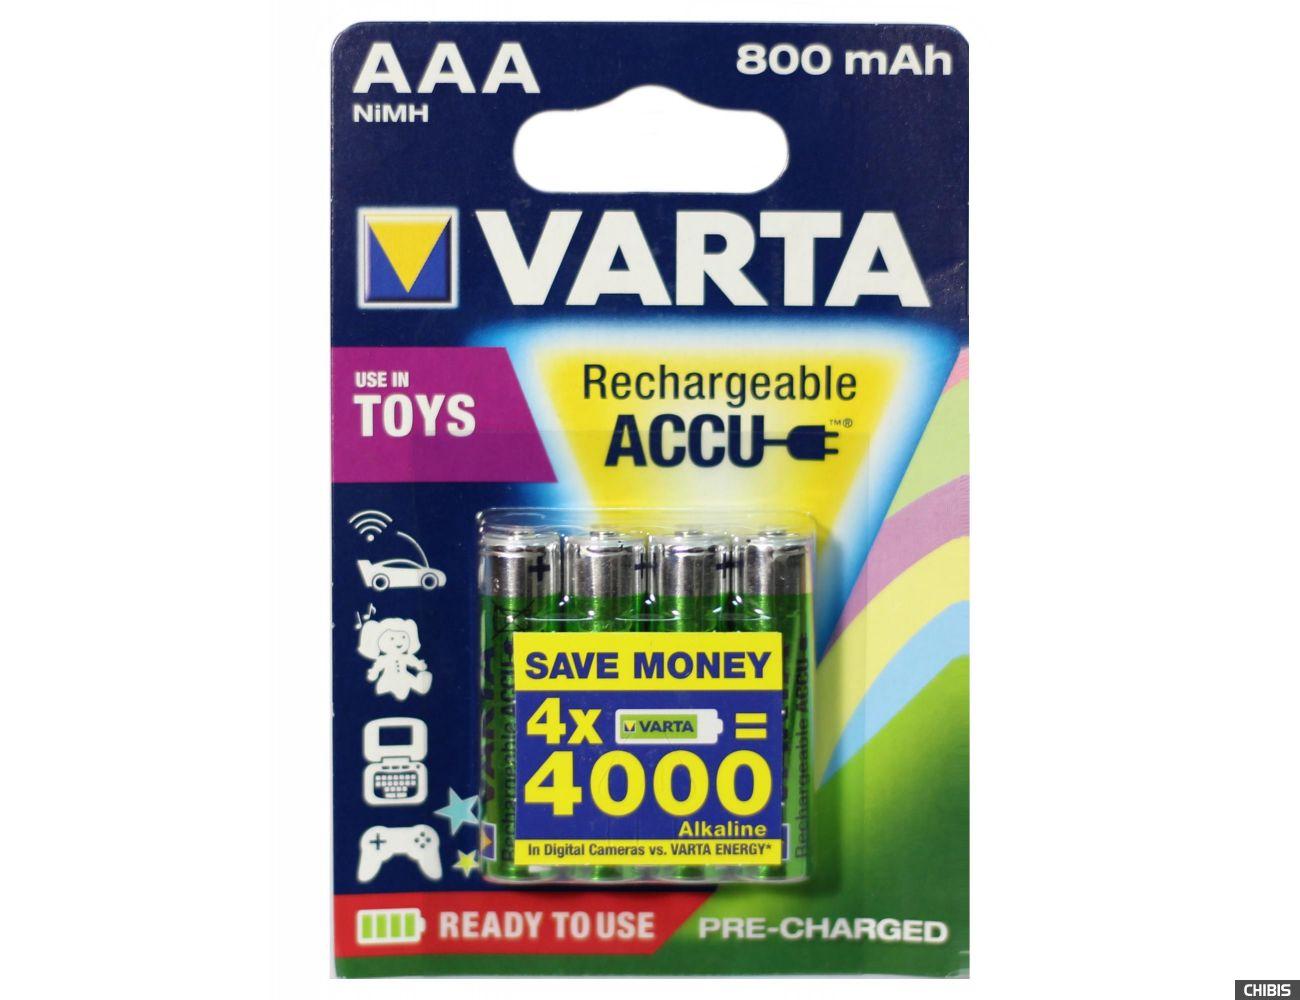 Аккумуляторы ААА Varta 800 mAh Toys Ni-Mh блистер 4 шт